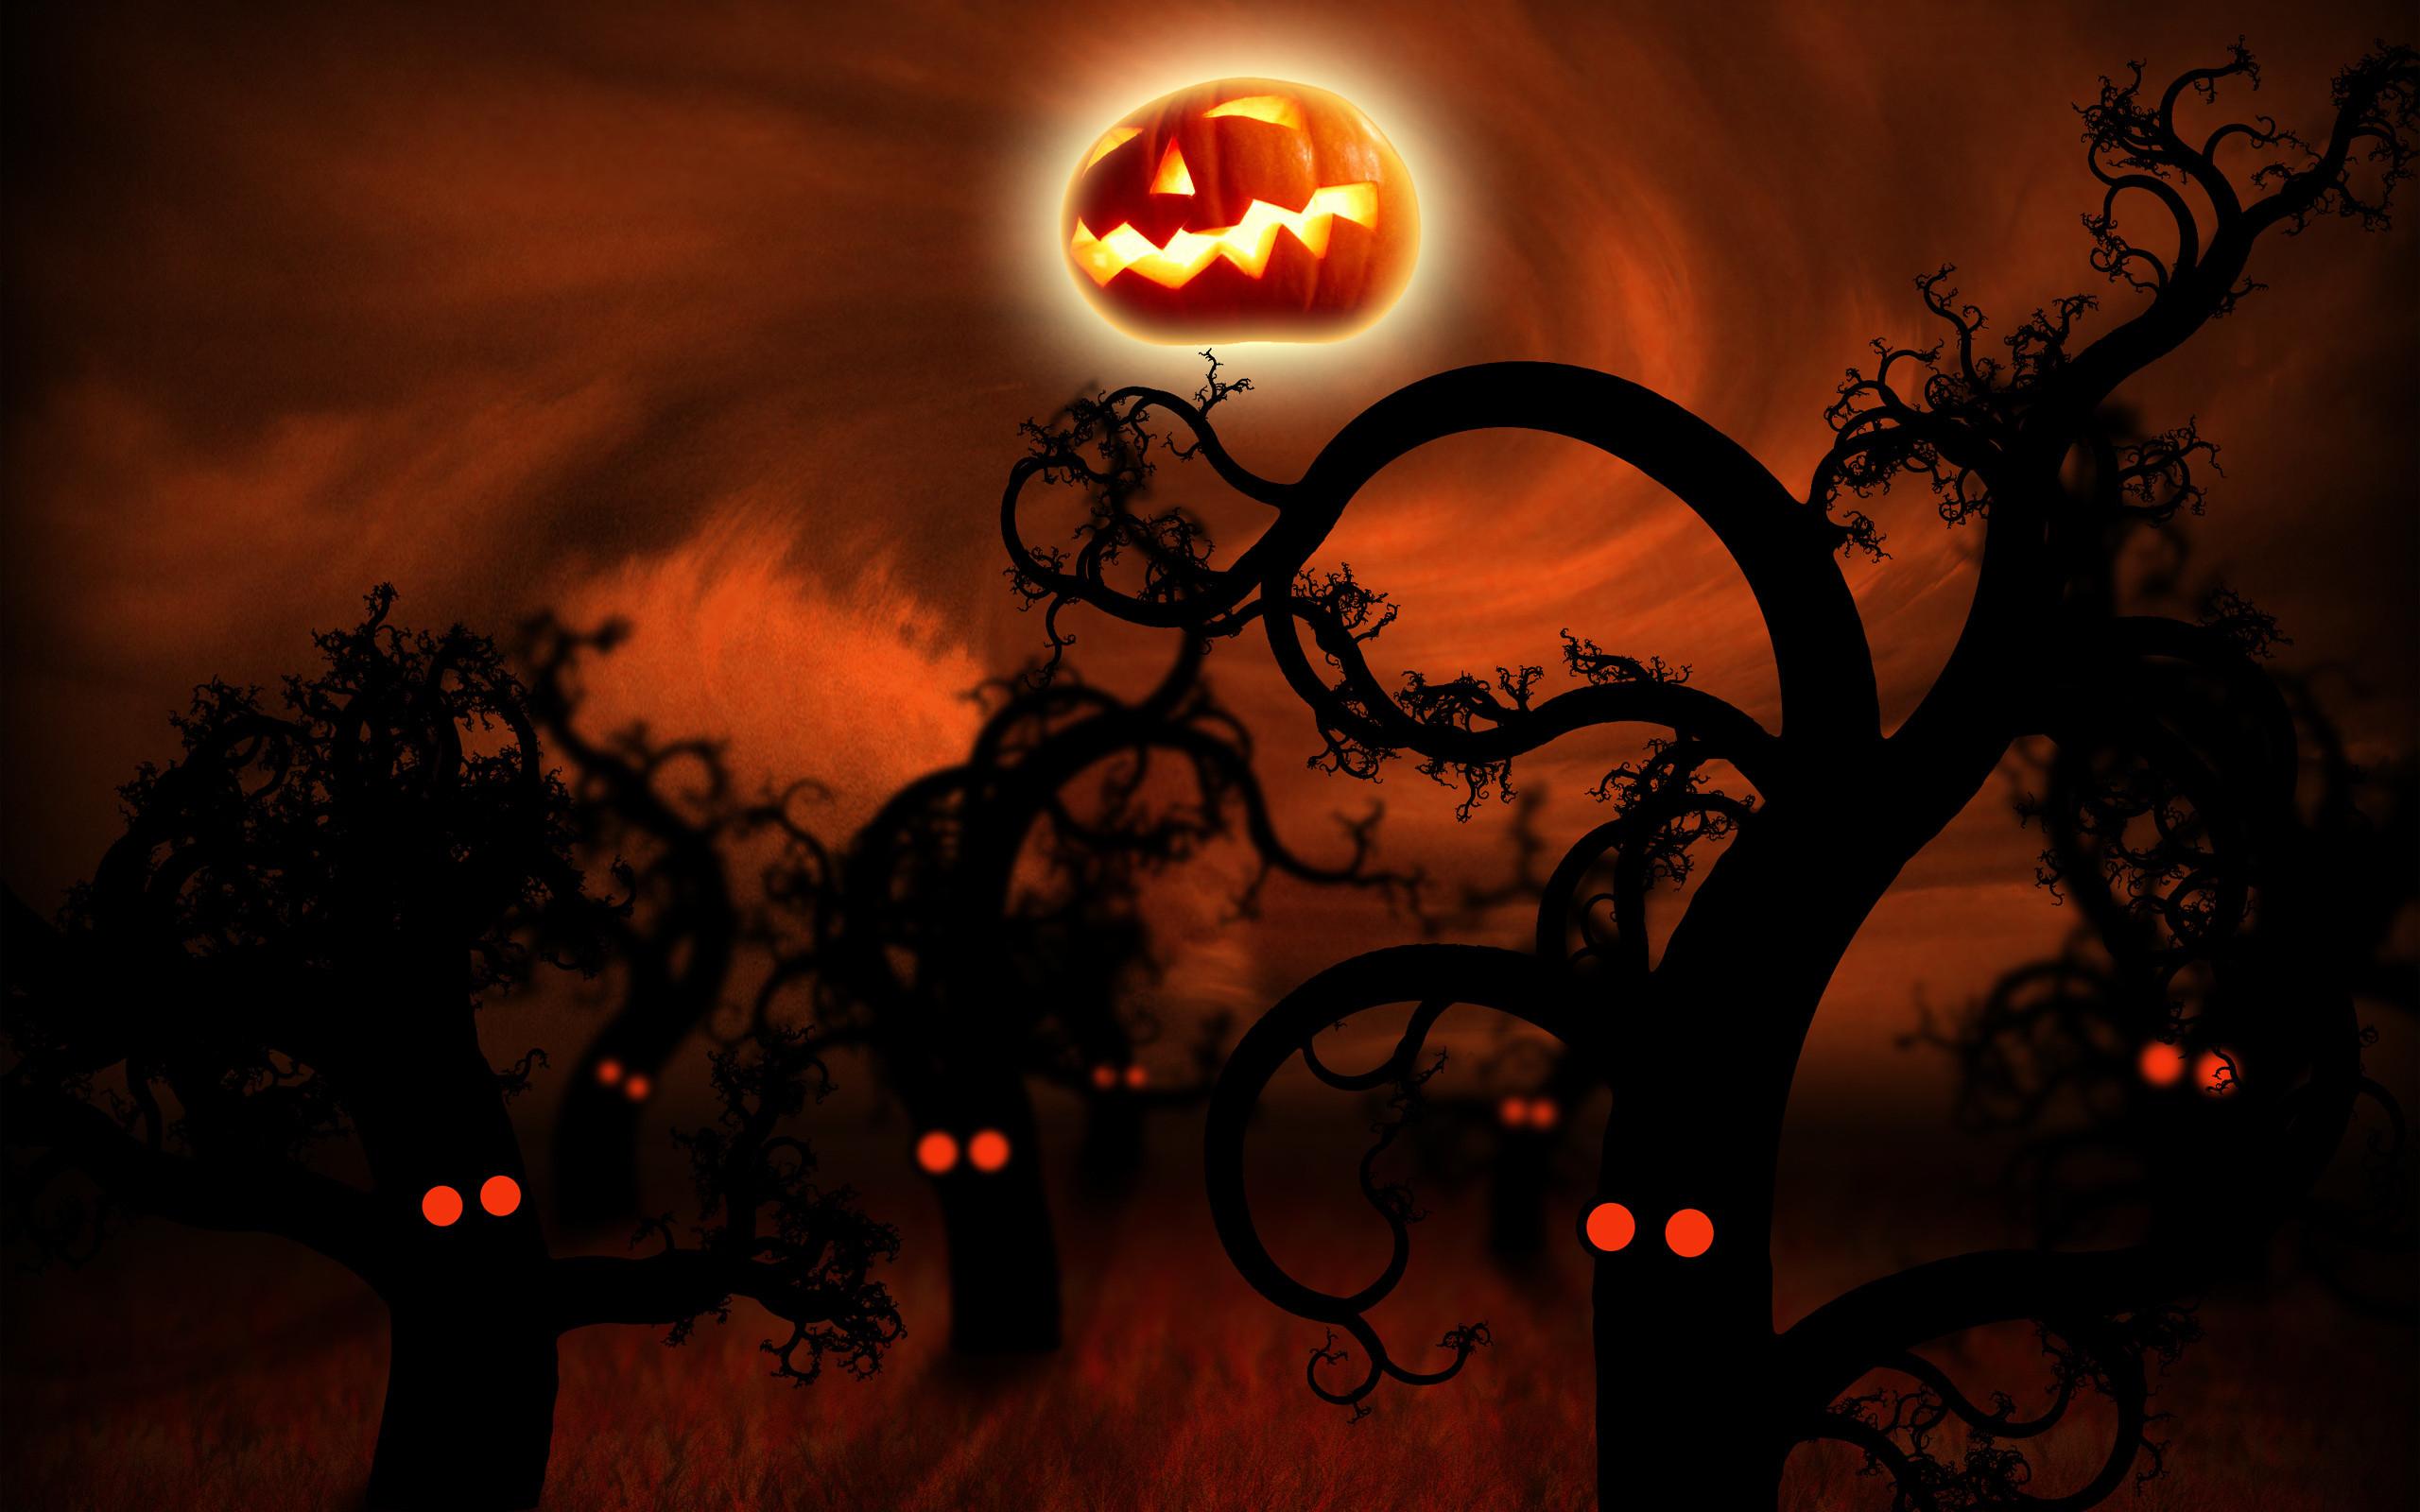 2560x1600 free halloween animated desktop wallpaper wallpapersafari download 1920x1200 widescreen